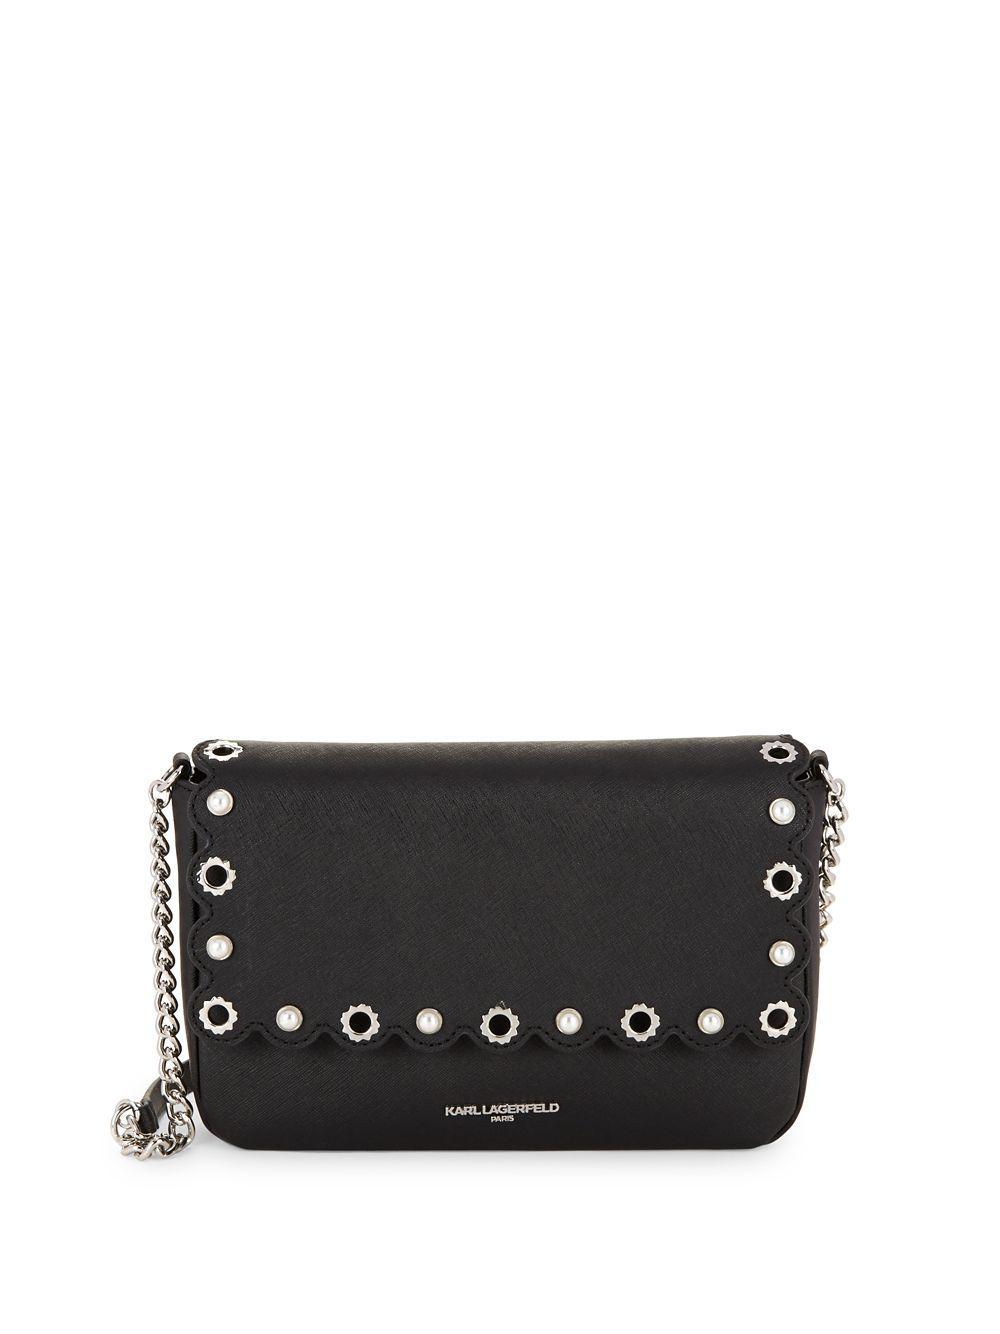 7bd8eeddeb20 Karl Lagerfeld Elsa Embellished Saffiano Foldover Crossbody in Black ...